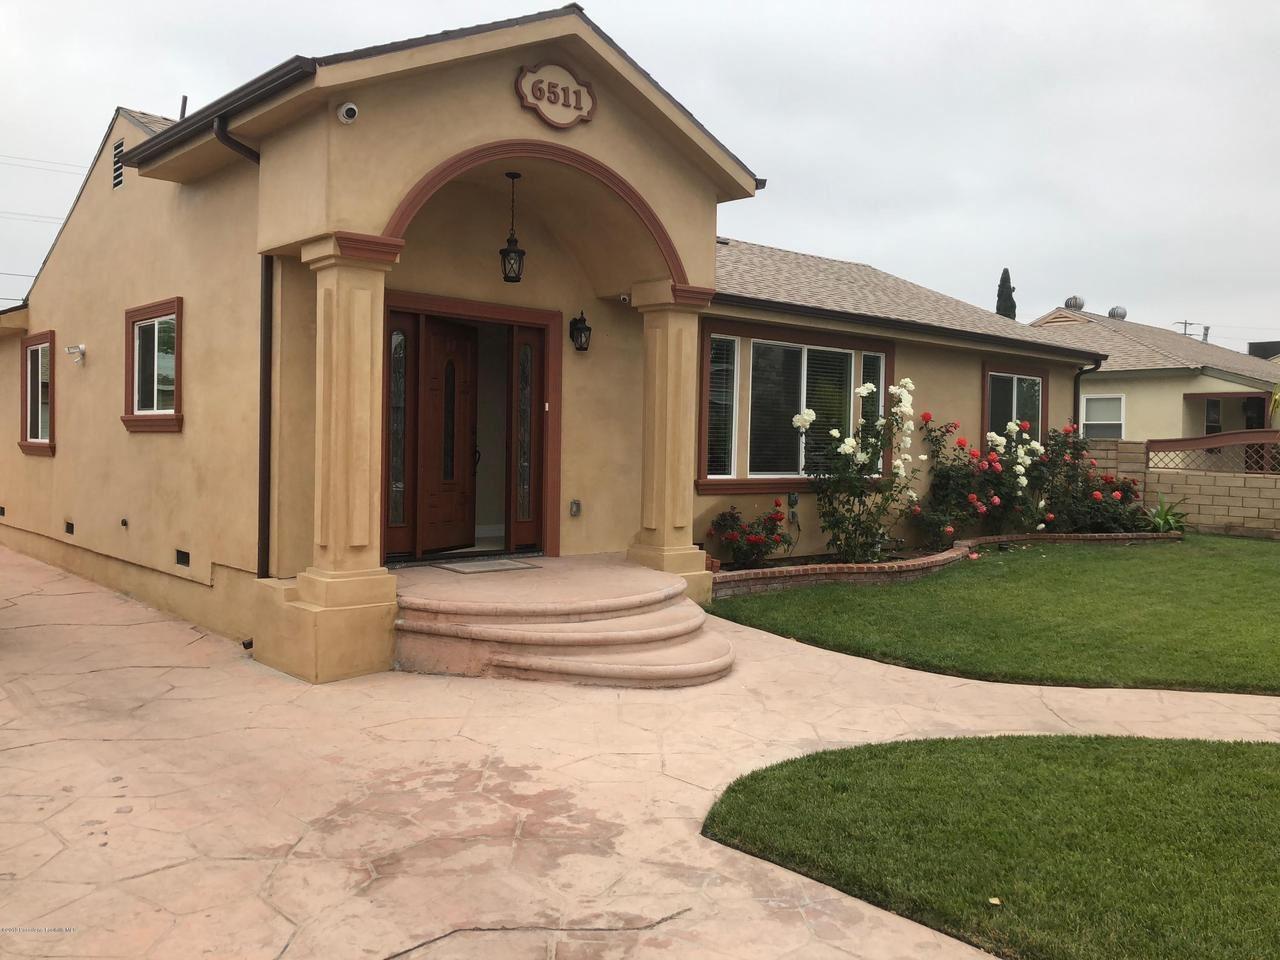 Photo of 6511 BONNER Avenue, North Hollywood, CA 91606 (MLS # 819004738)